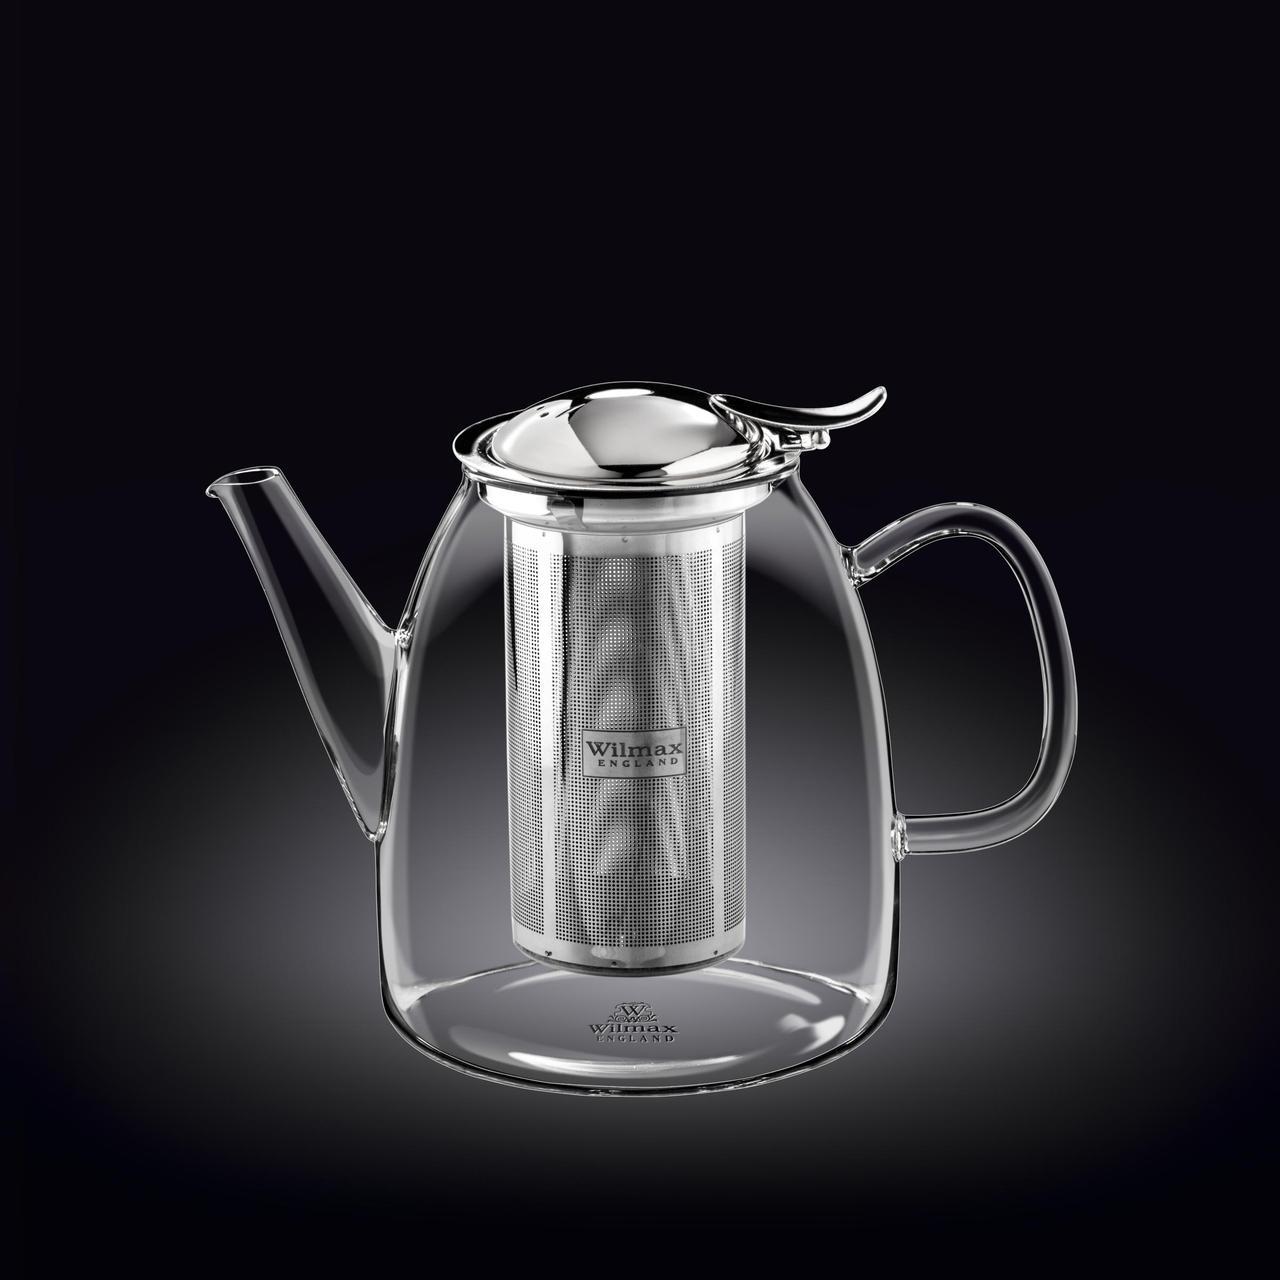 Чайник заварочный 1450 мл Thermo Wilmax Нержавеющий фильтр